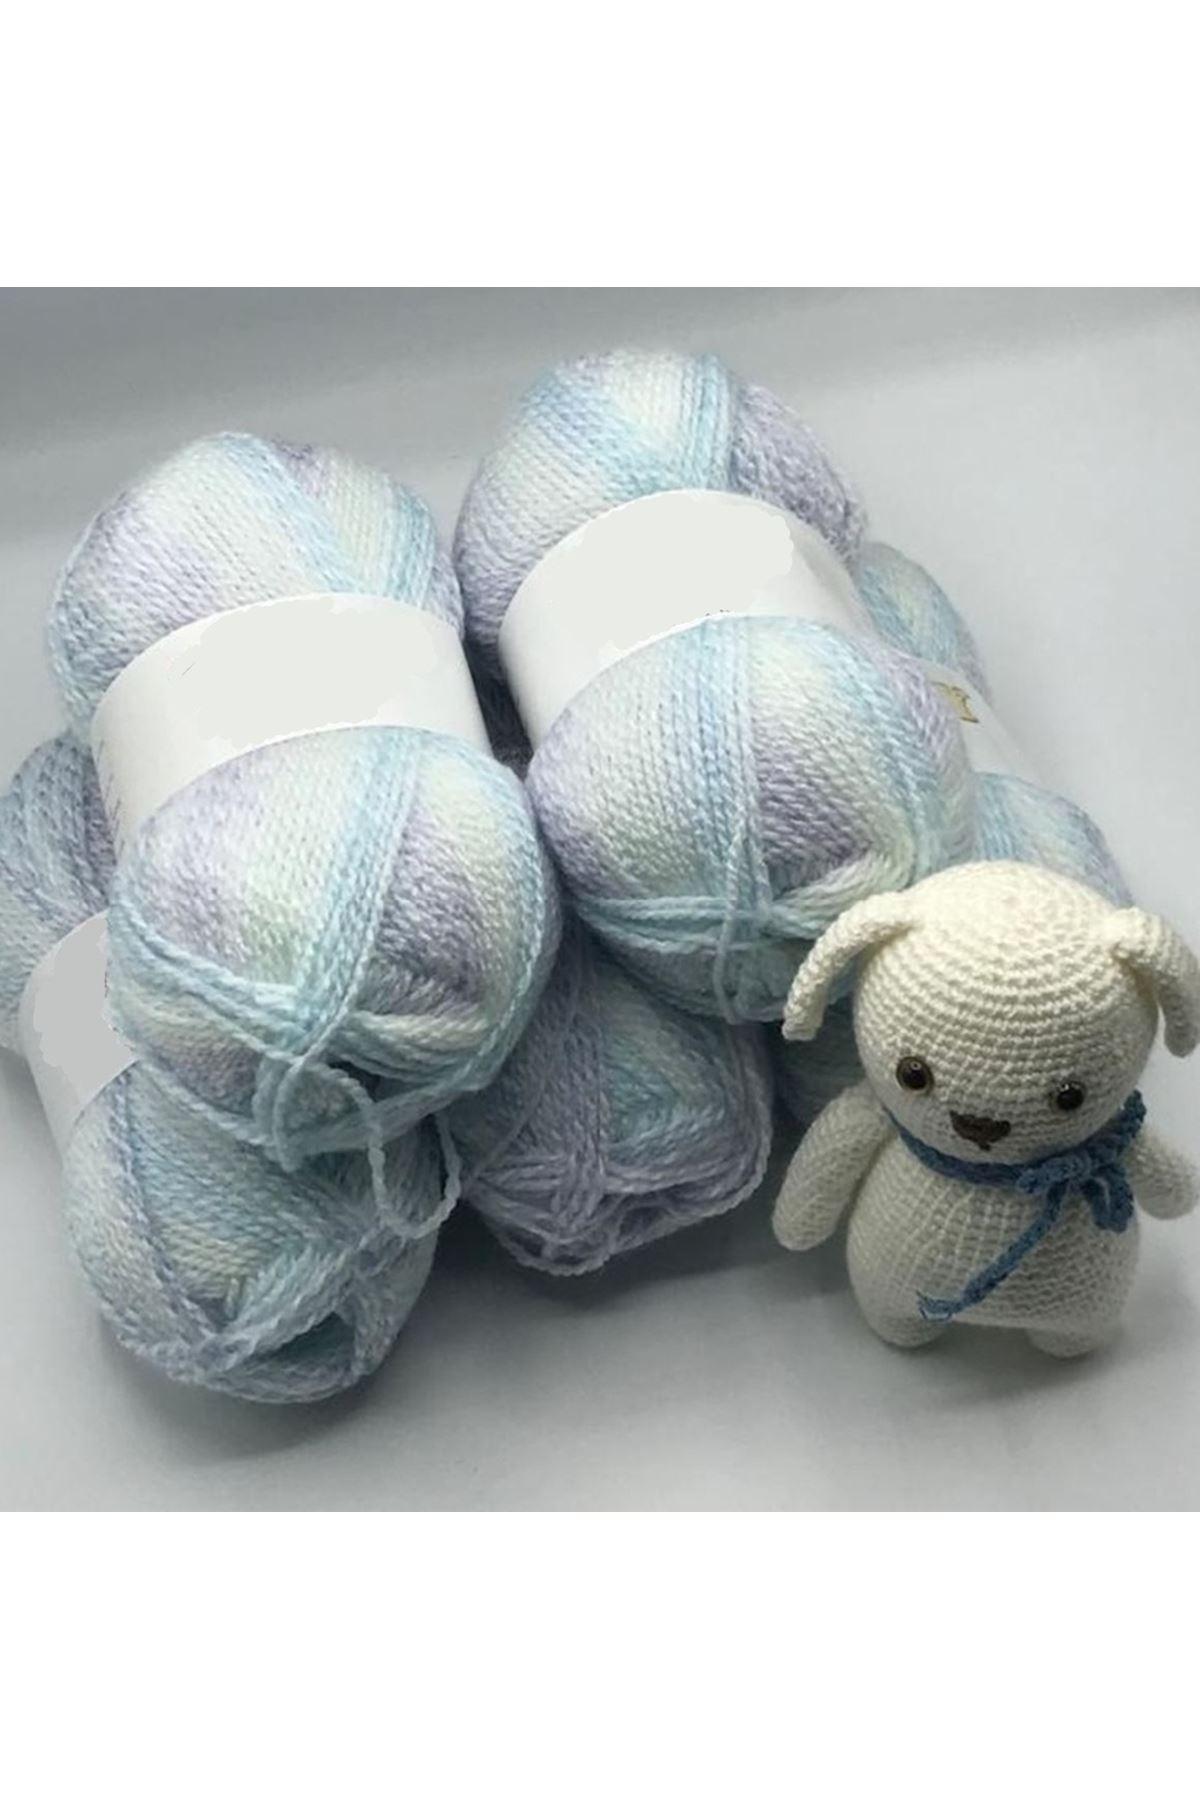 İhrac Fazlası 5'li Paket Bebe İpi Mavi Batik 273